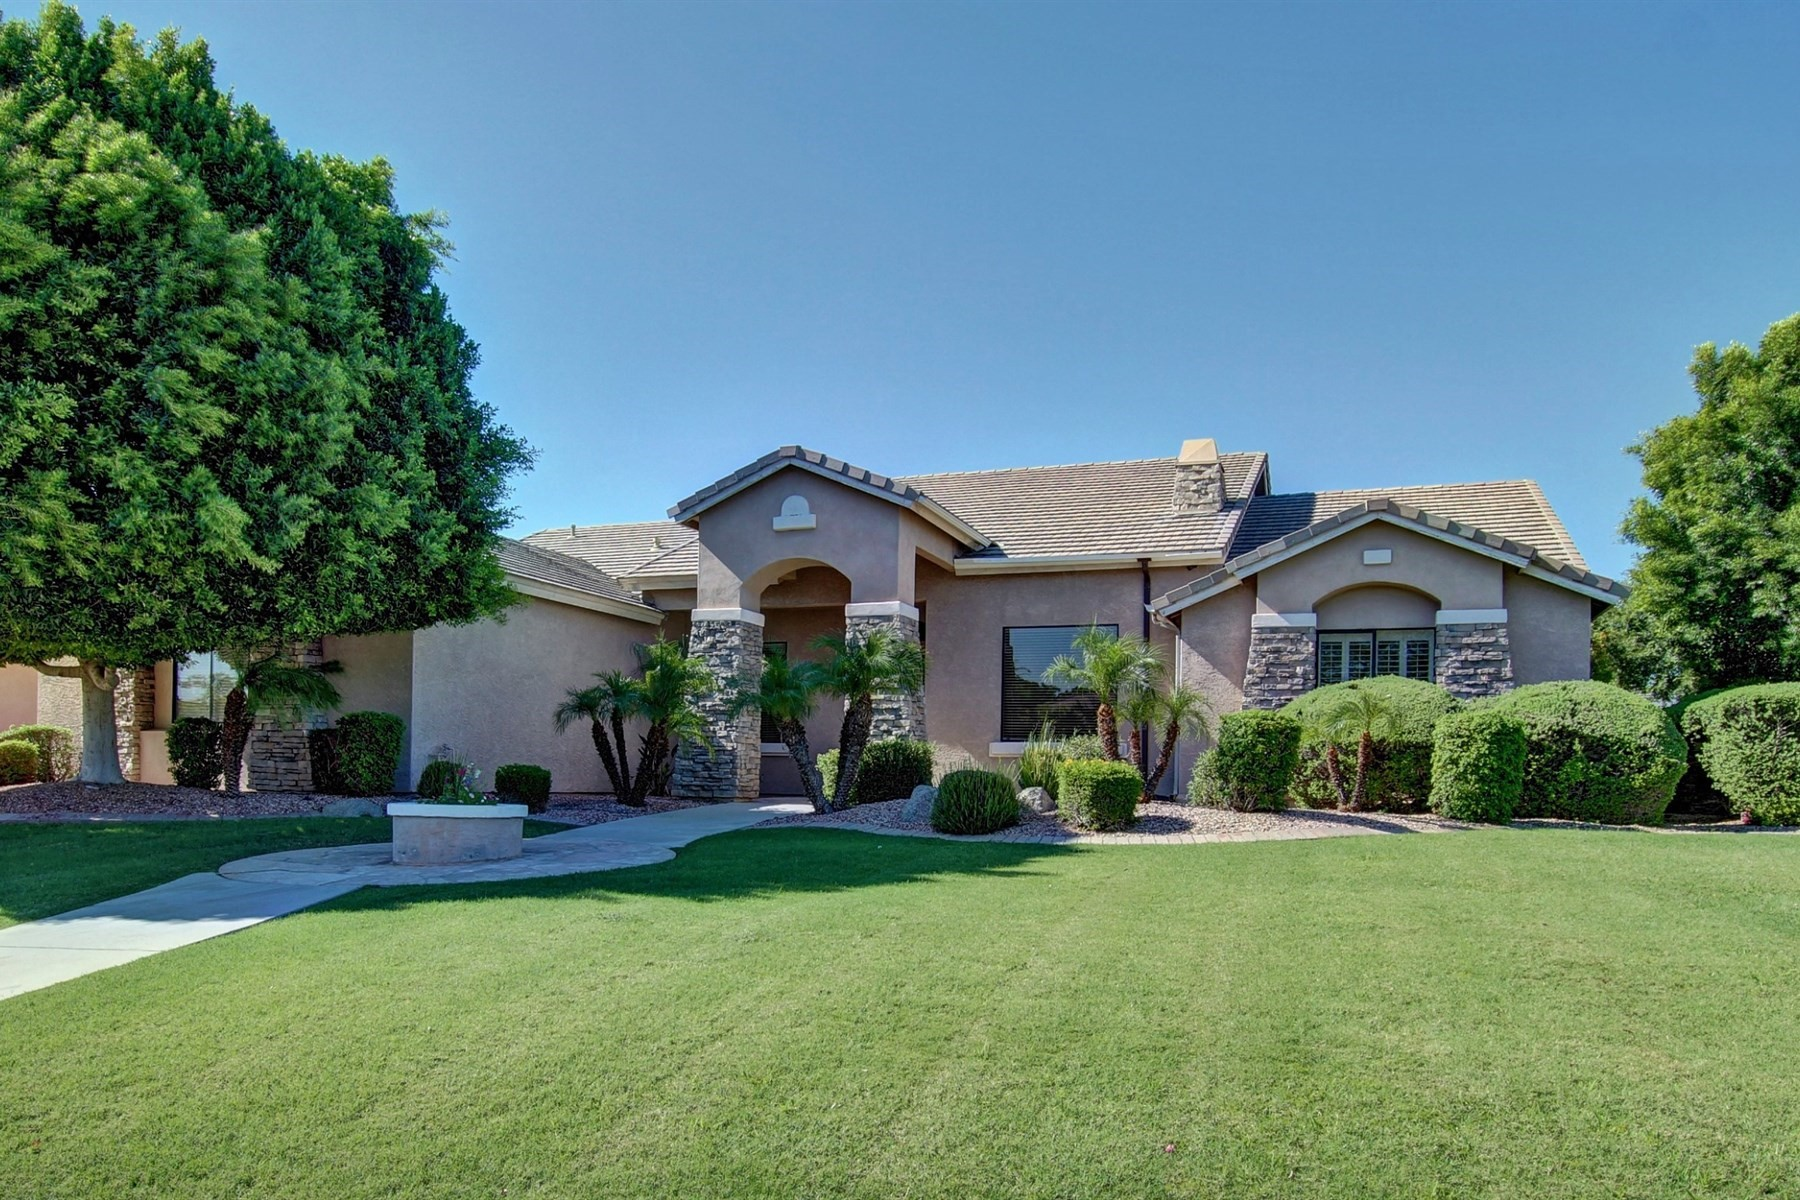 واحد منزل الأسرة للـ Sale في Beautiful Mesa home in Alta Mira Estates 6964 E Grandview St Mesa, Arizona, 85207 United States